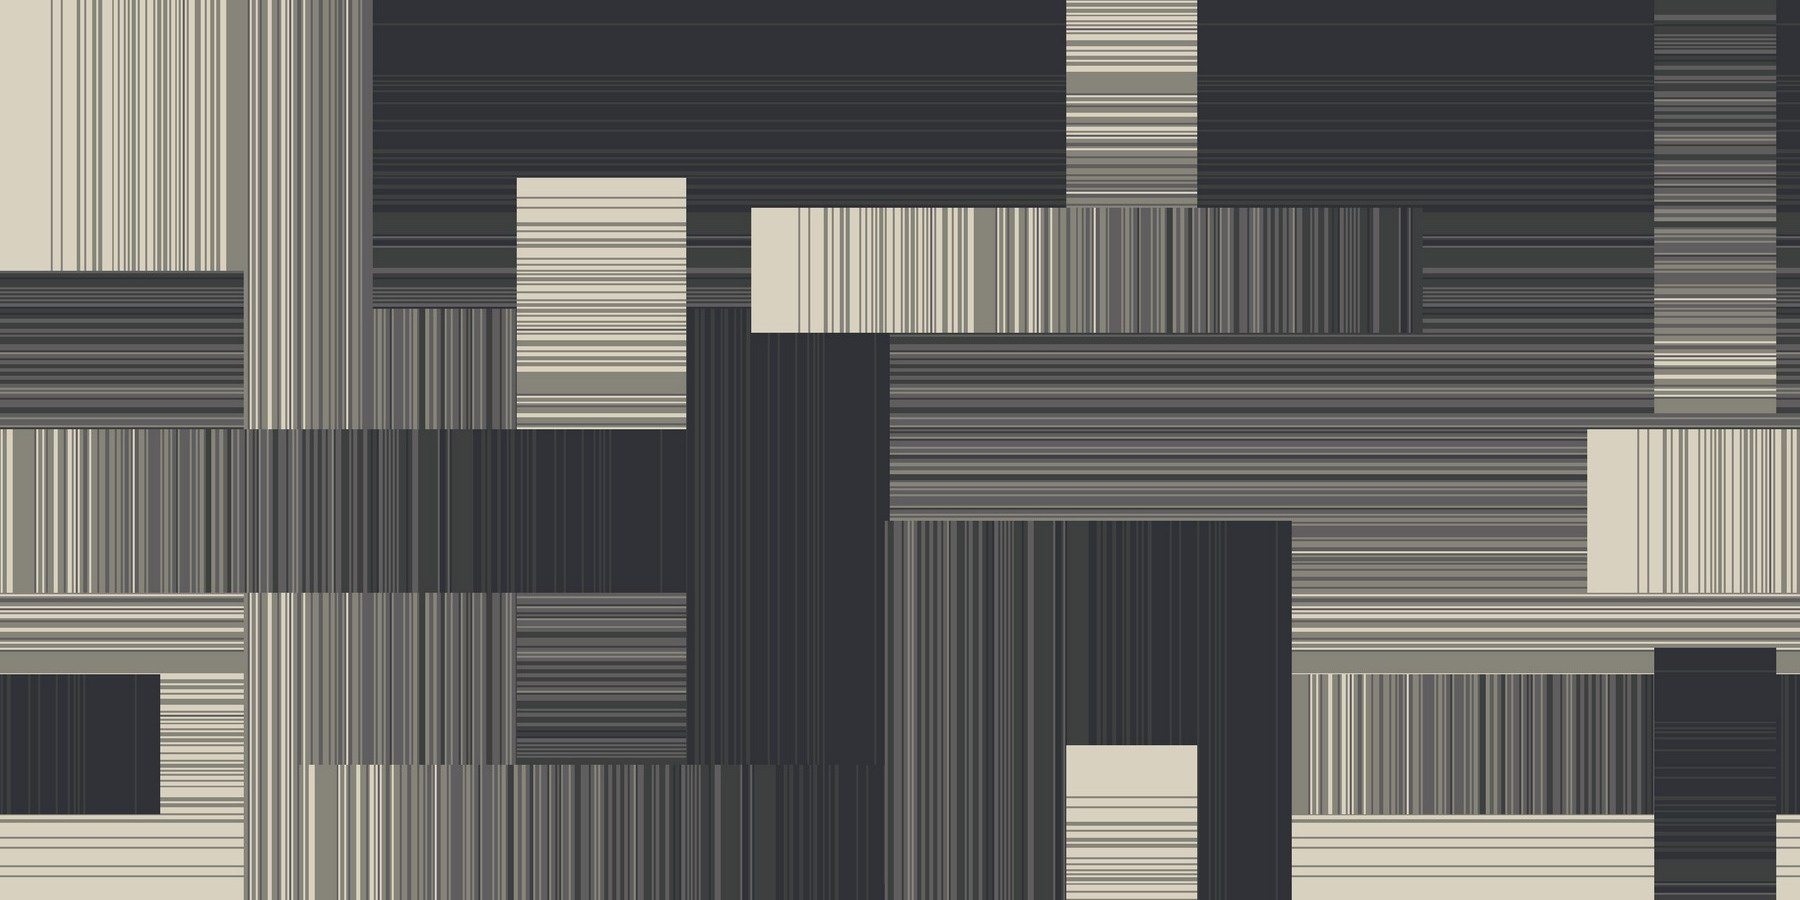 kfr120qw sdyb d3接线图